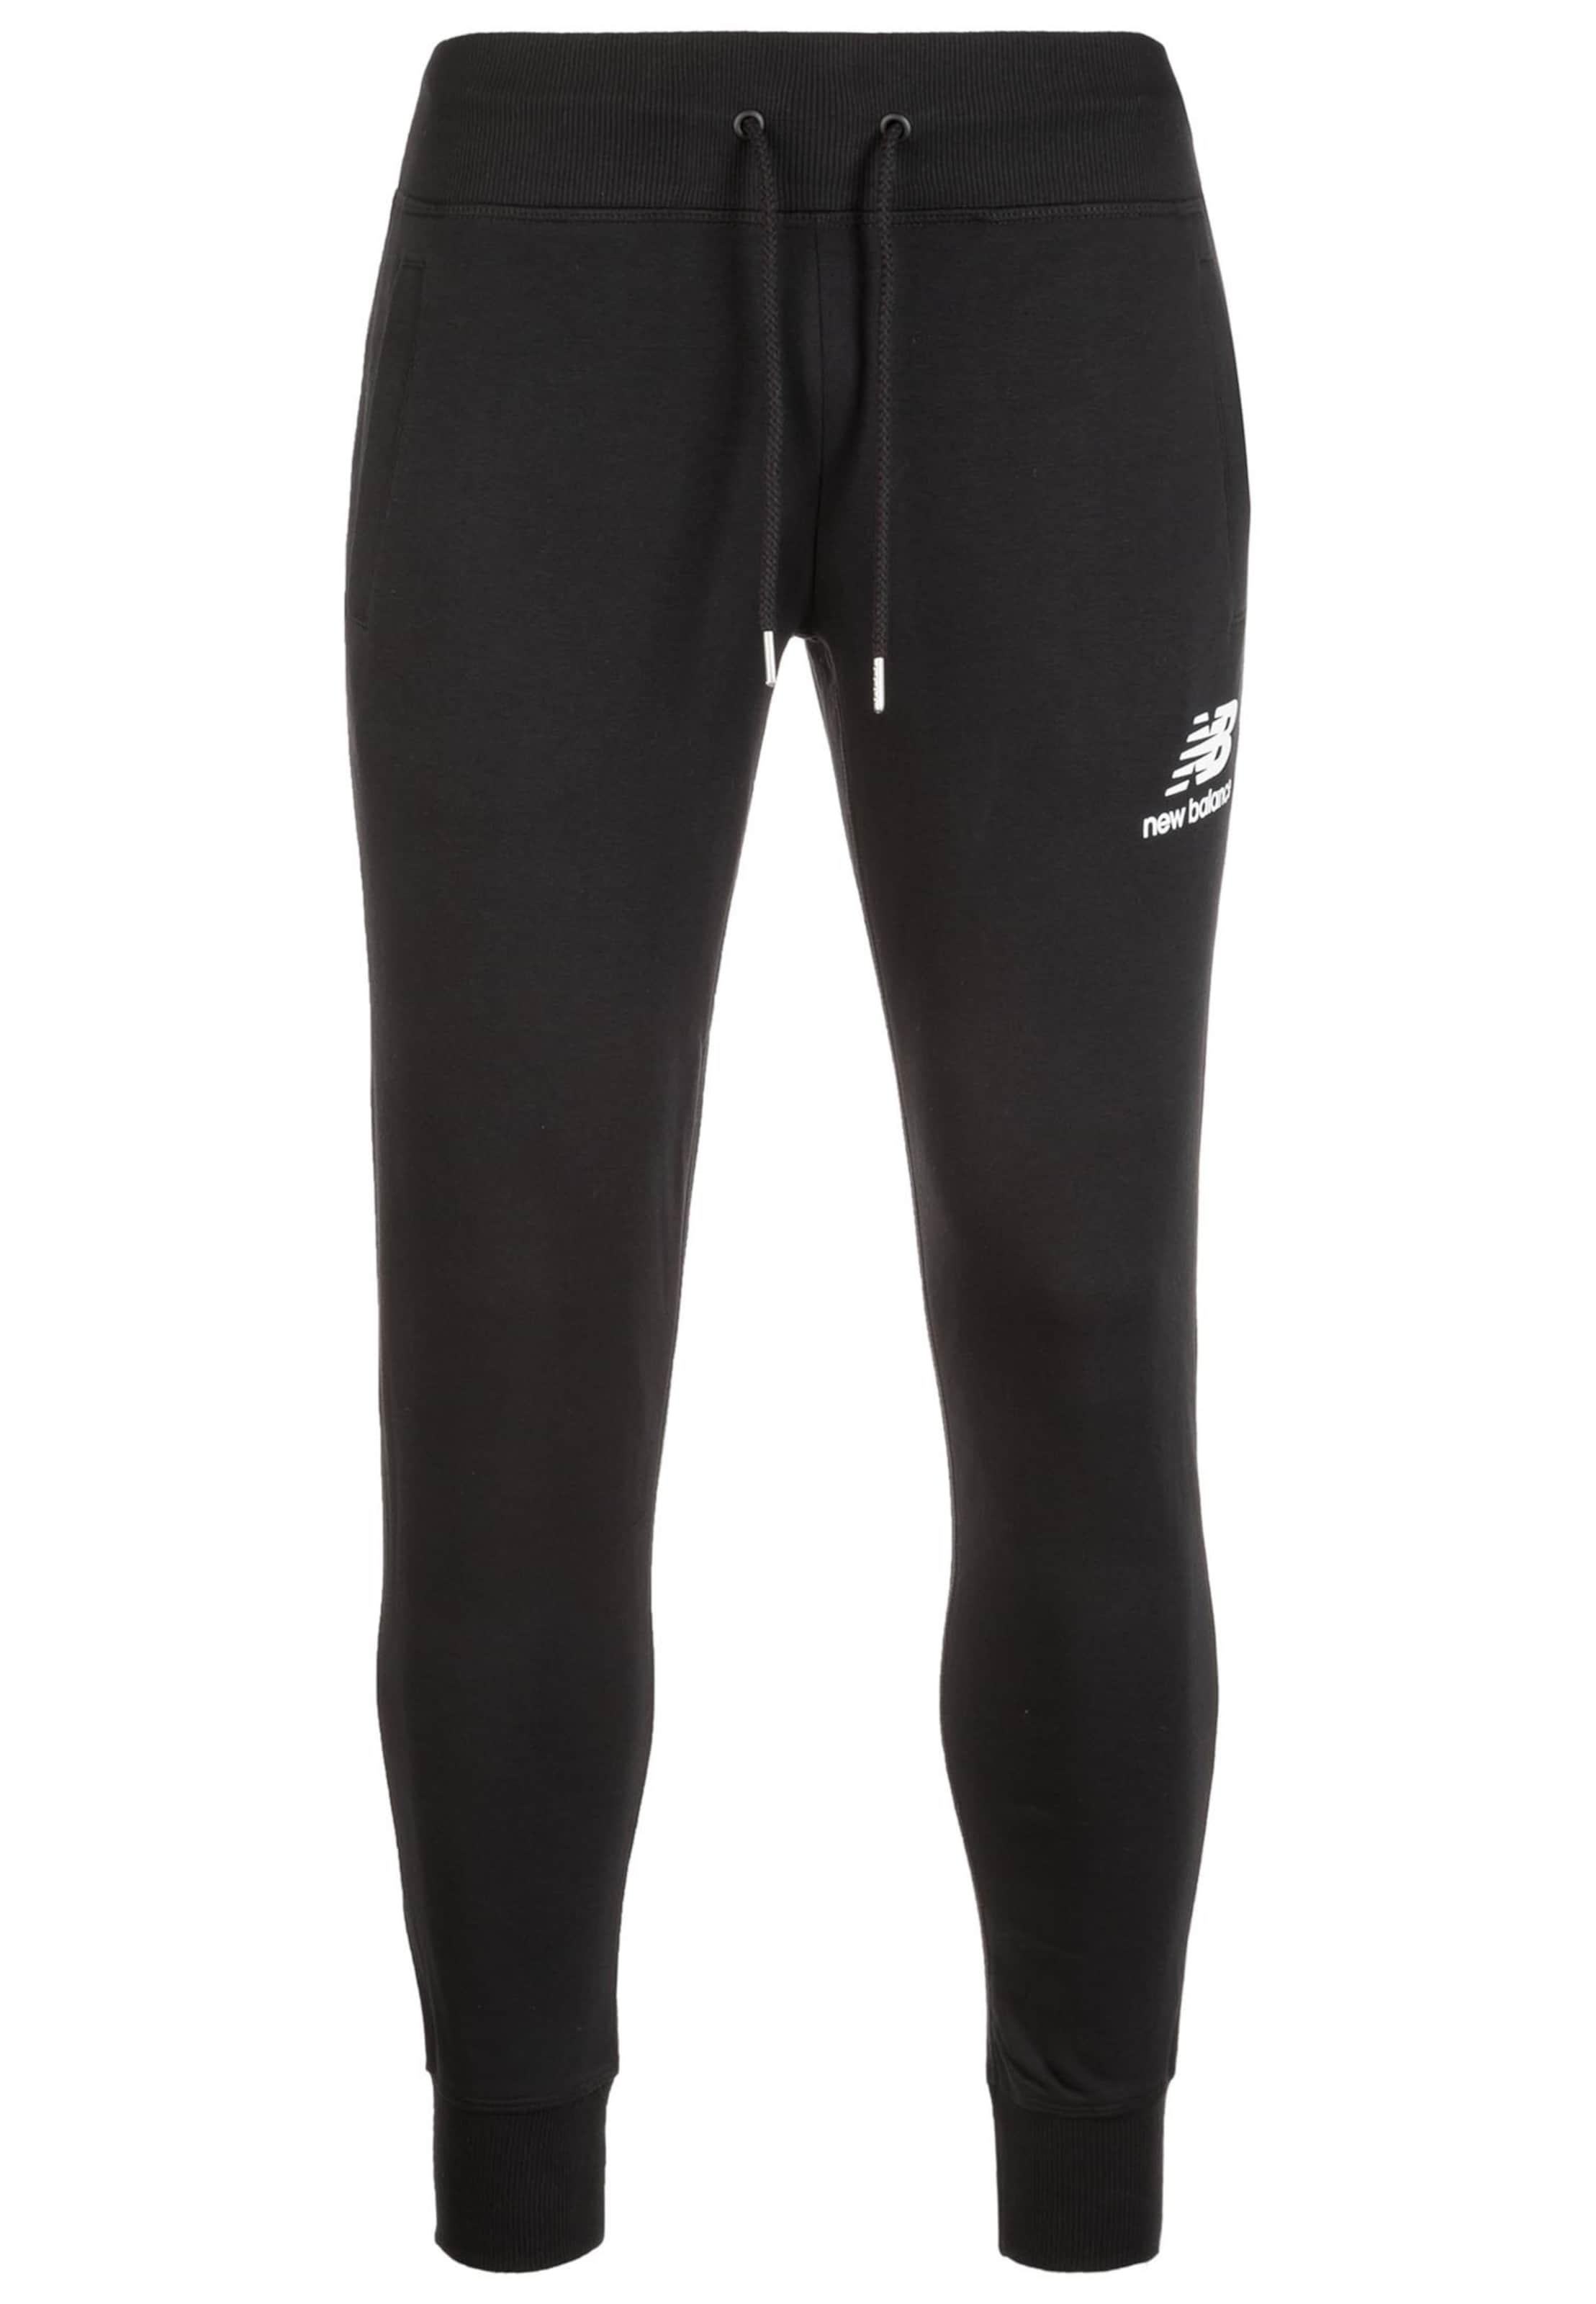 En 'essentials' New Pantalon Balance NoirBlanc mNyO80wvn